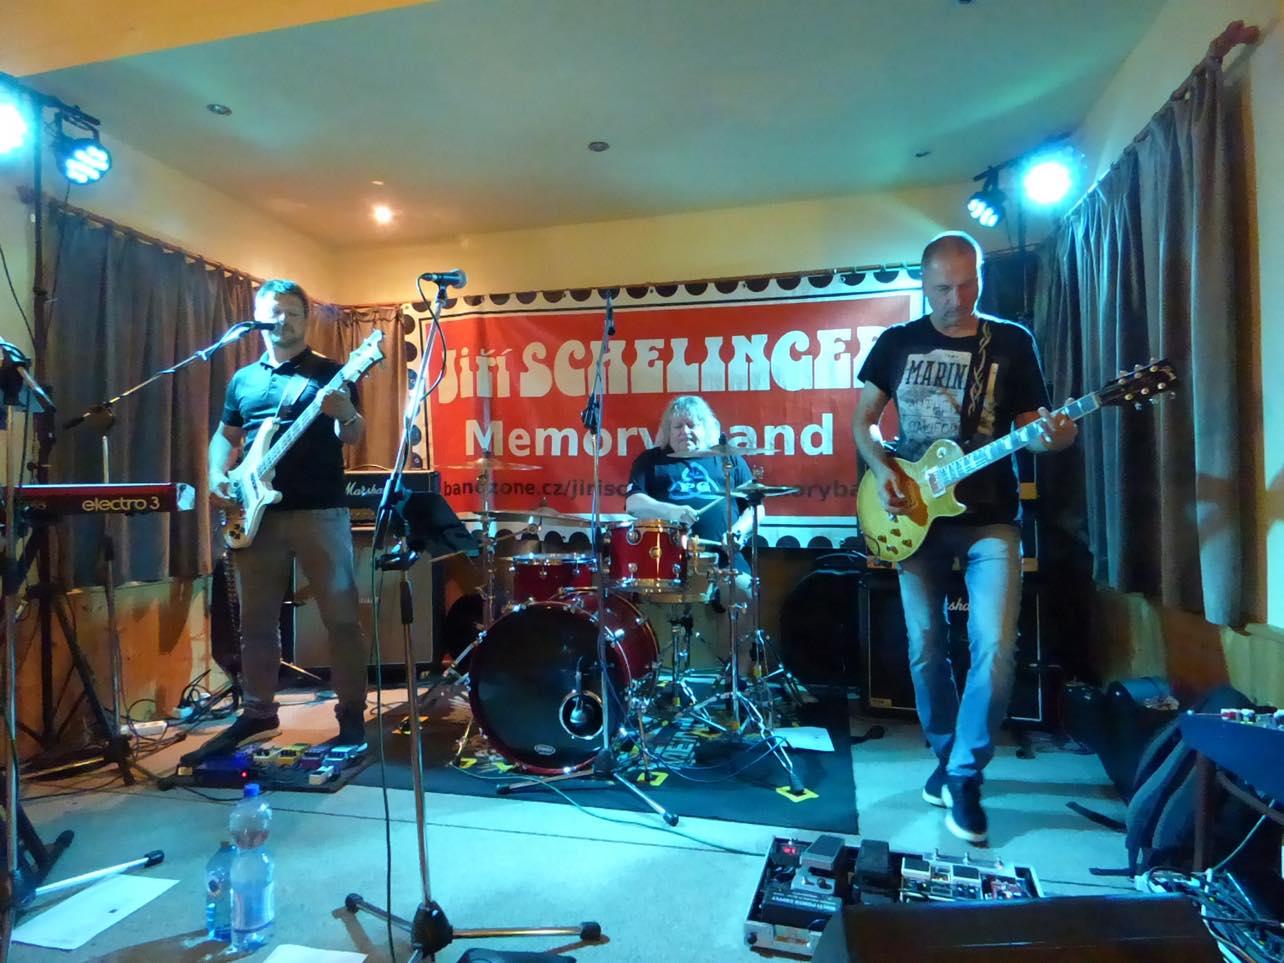 Jiří Schelnger Memory Band